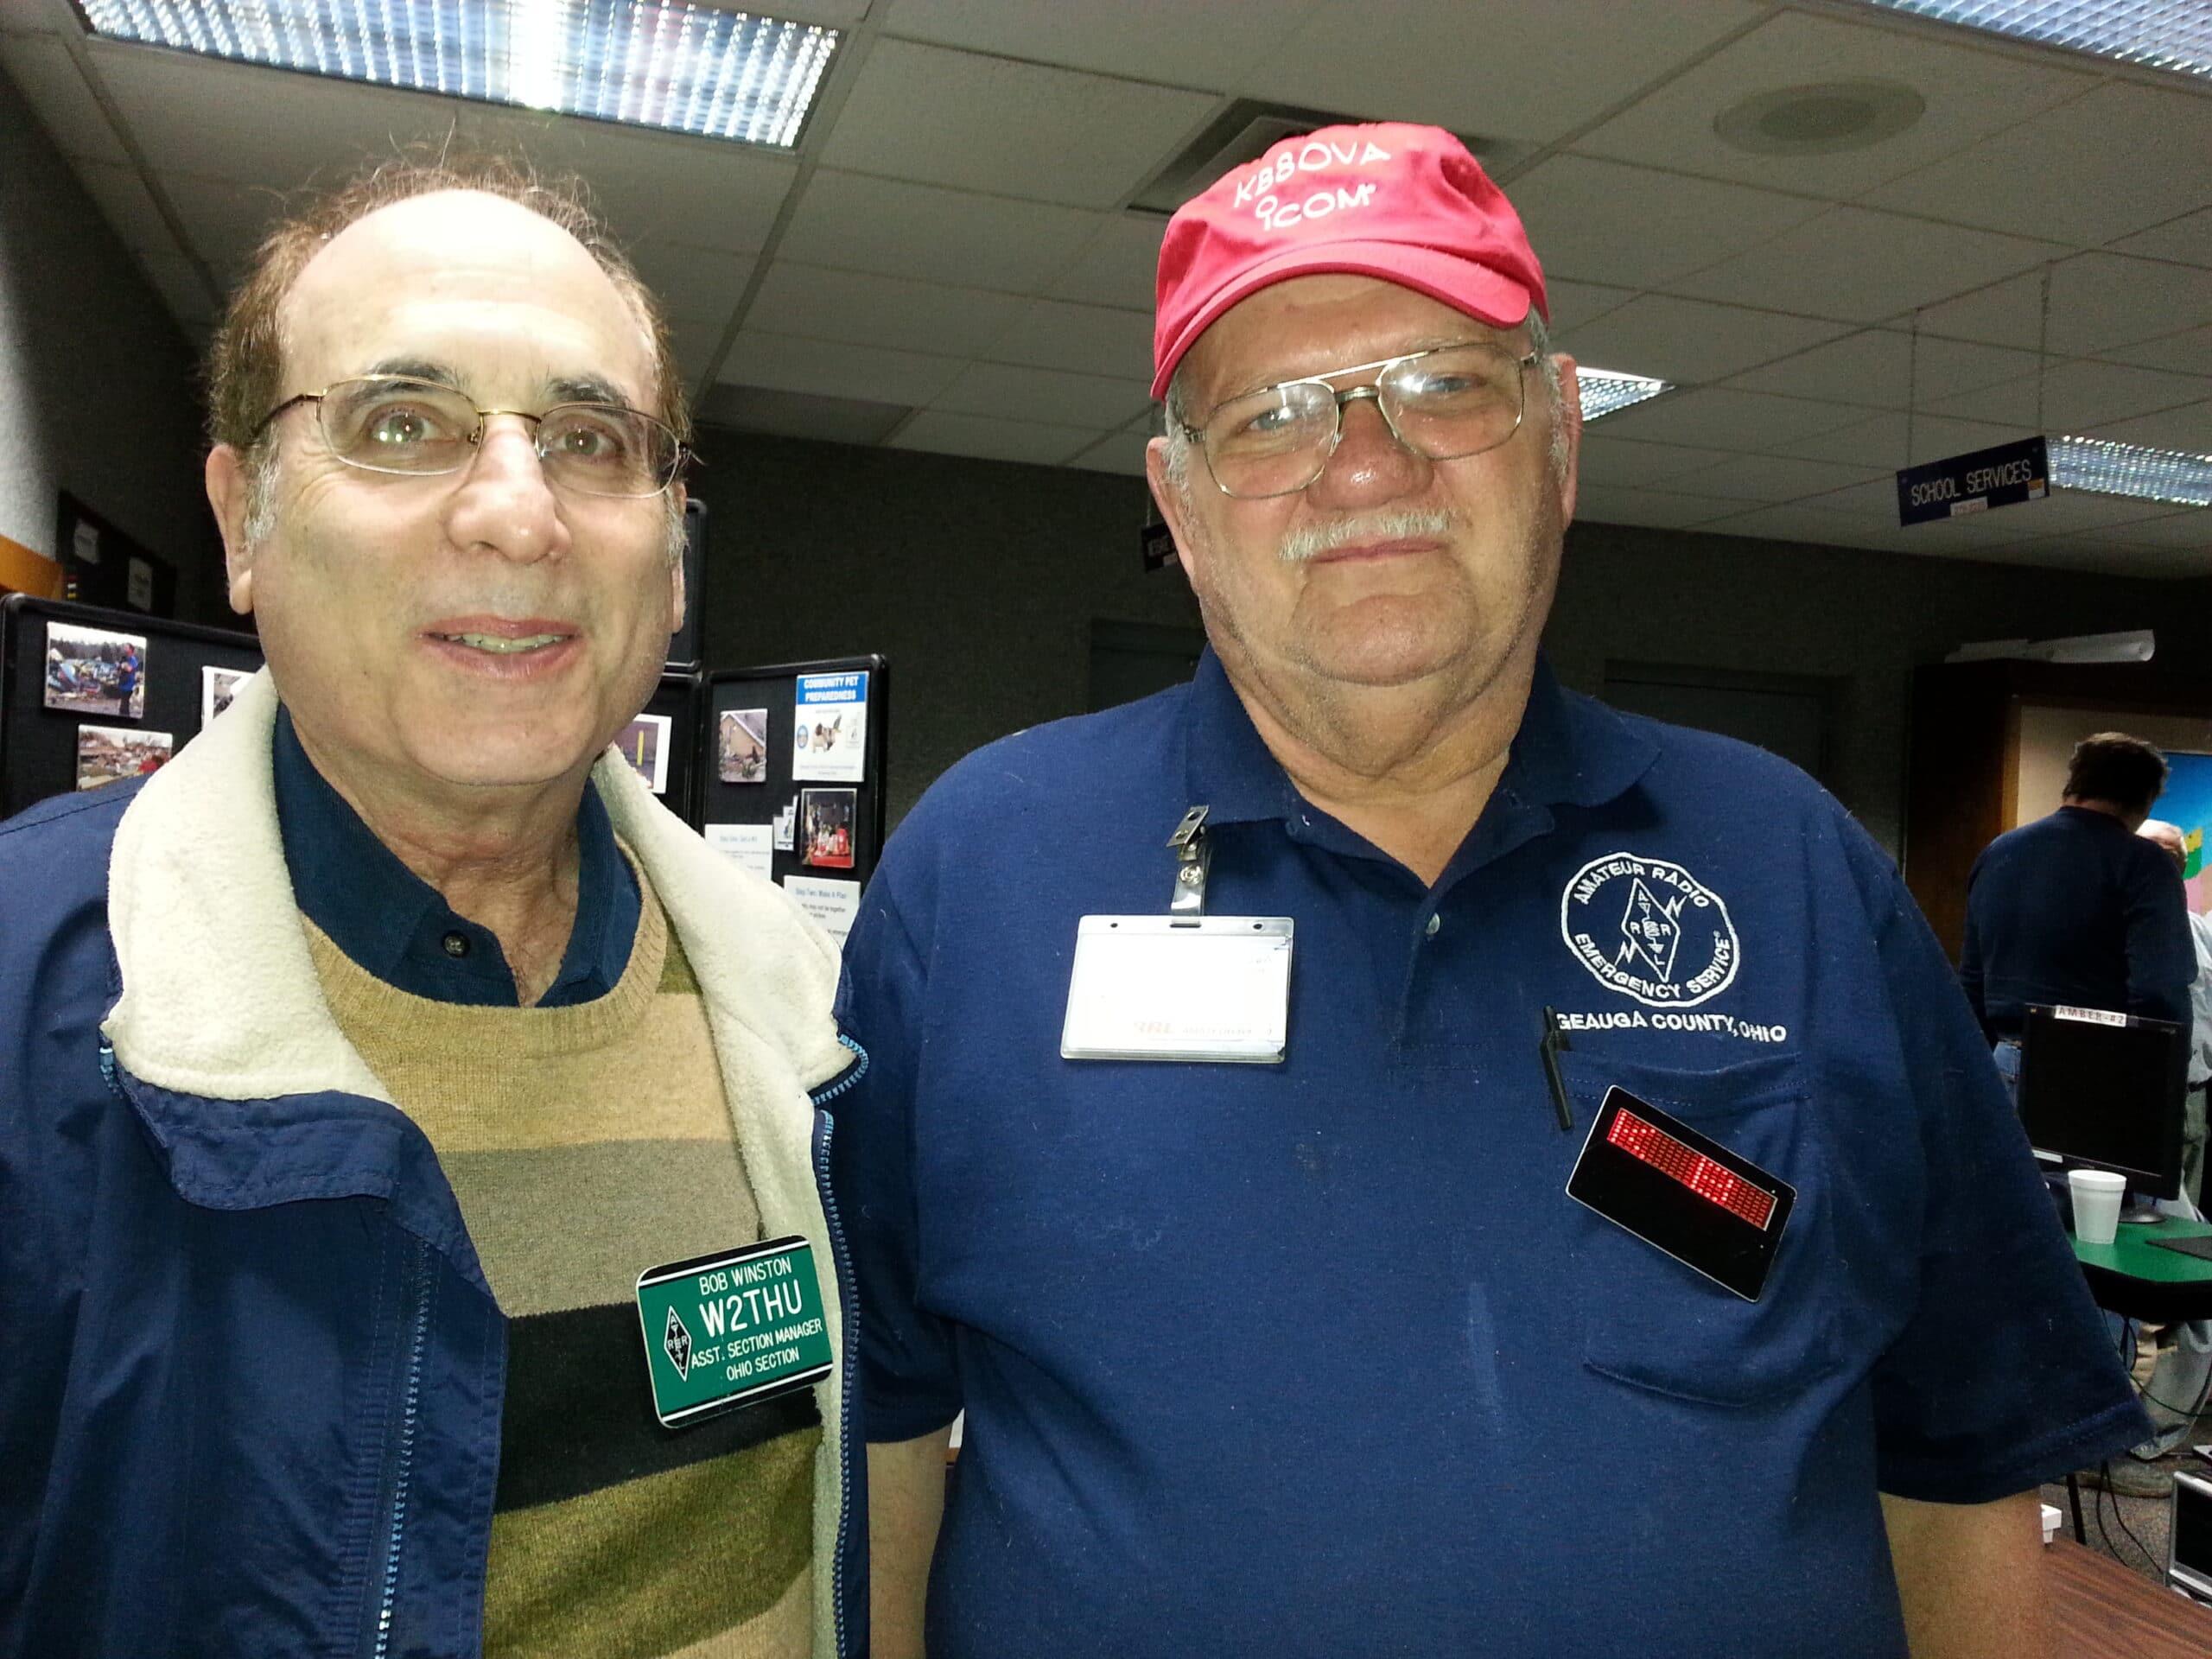 Bob W2THU and Lyle KB8OVA